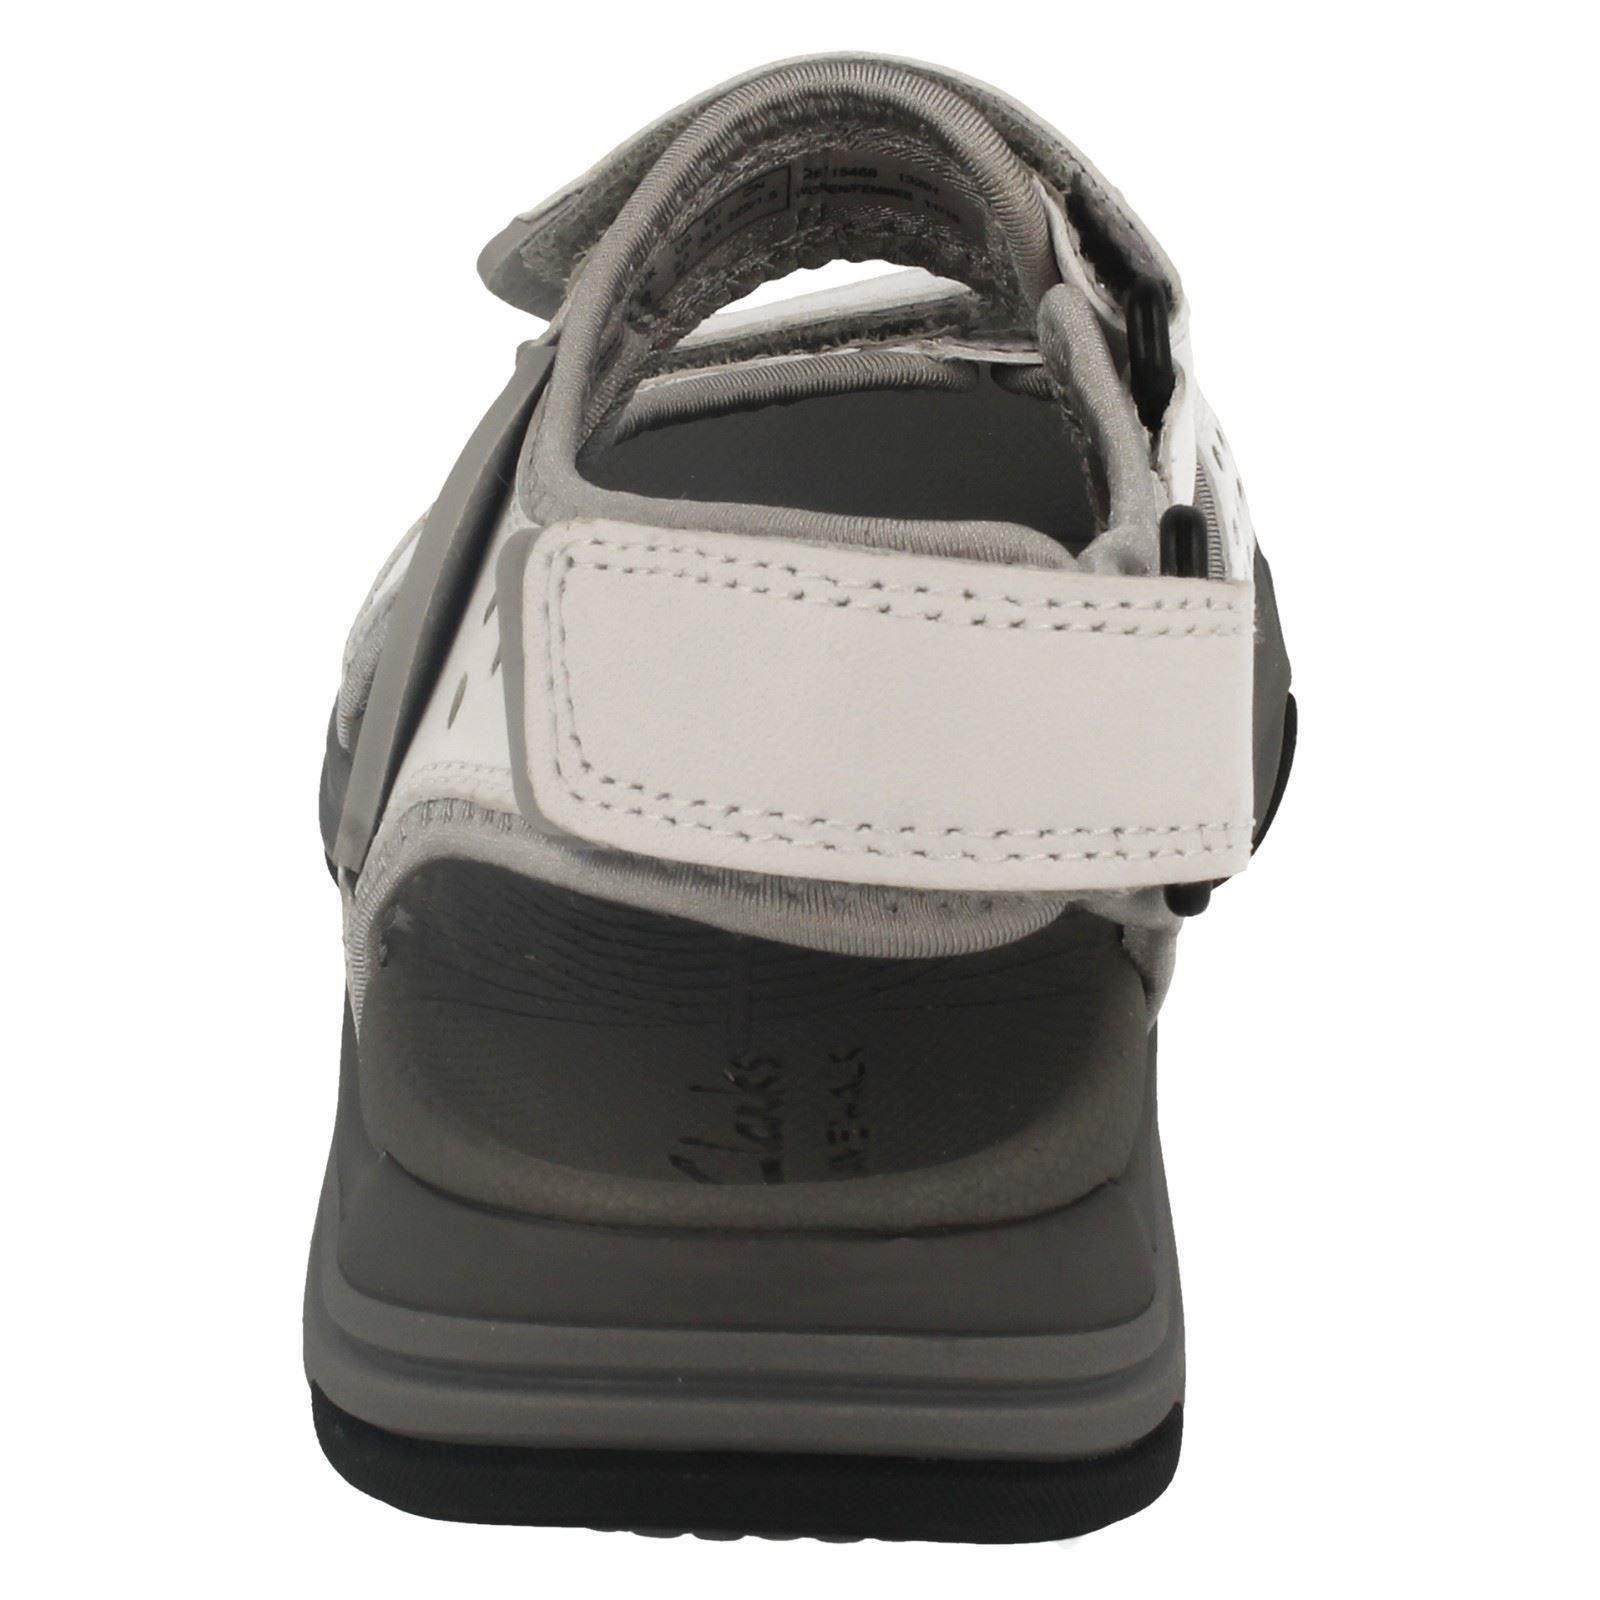 Señoras Clarks De Cuero Correa De Velcro Casual Sandalias Etiqueta Ola-Presto